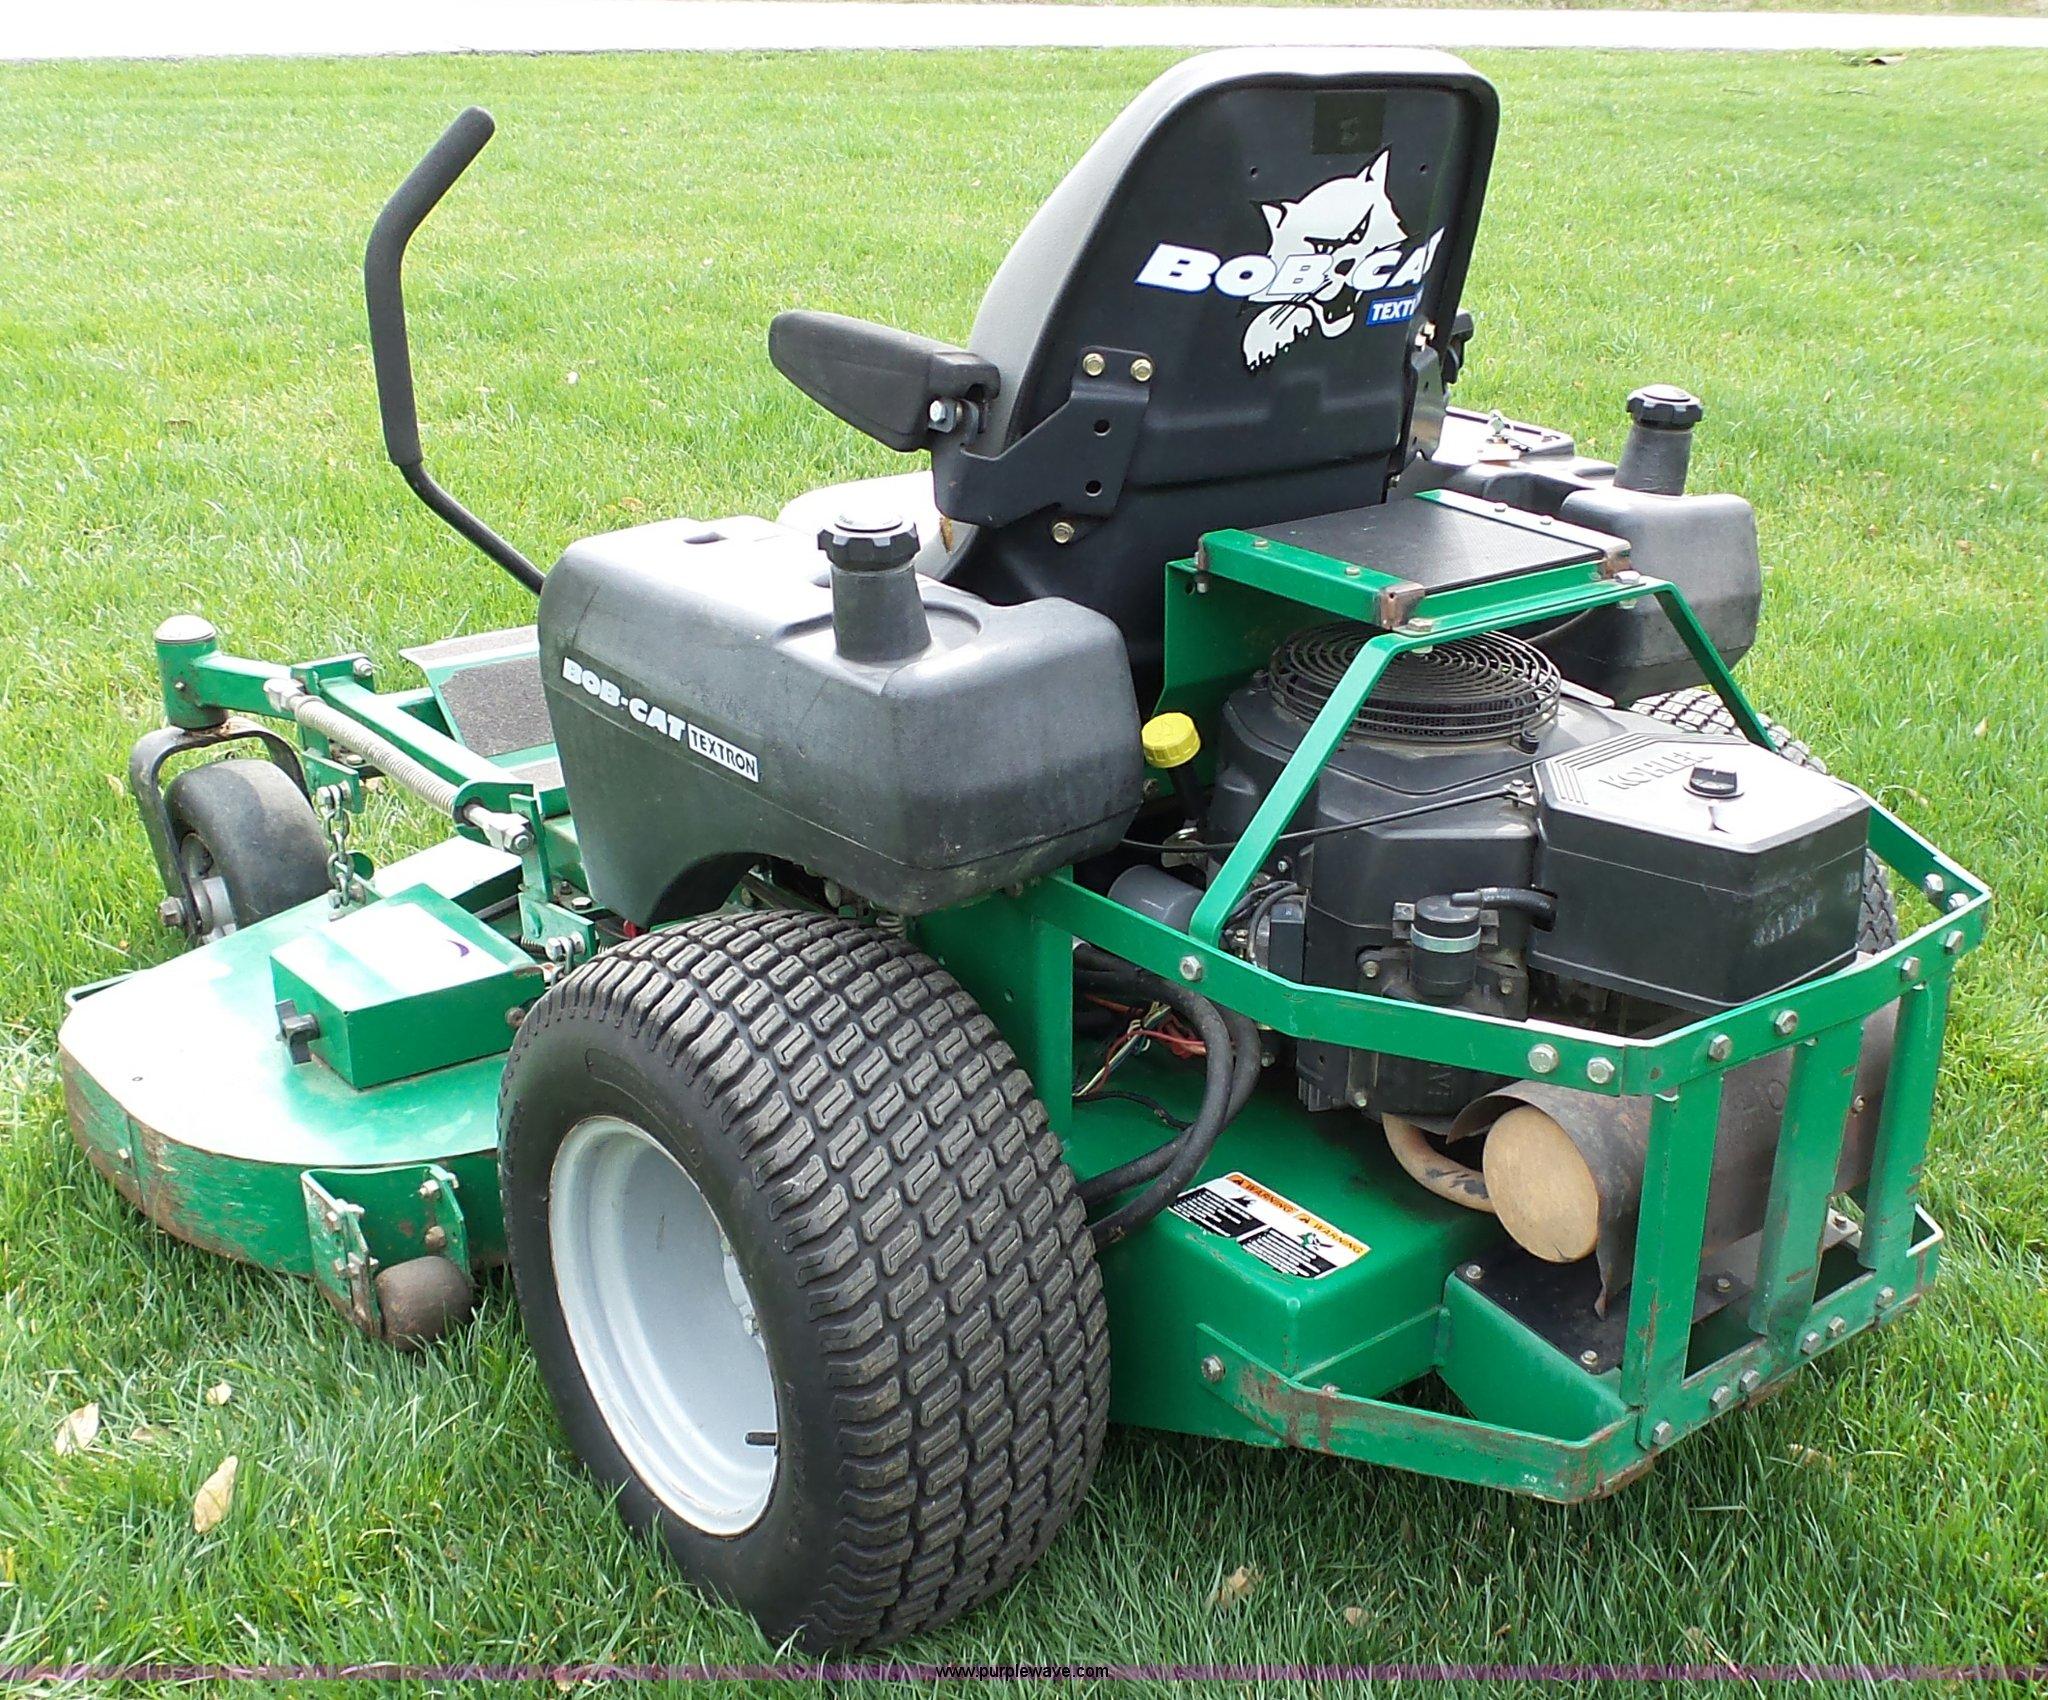 textron bobcat ztr lawn mower item k1333 sold may 18 ve rh purplewave com Textron Bobcat Mowers Parts Bobcat Textron Mower Parts Breakdown